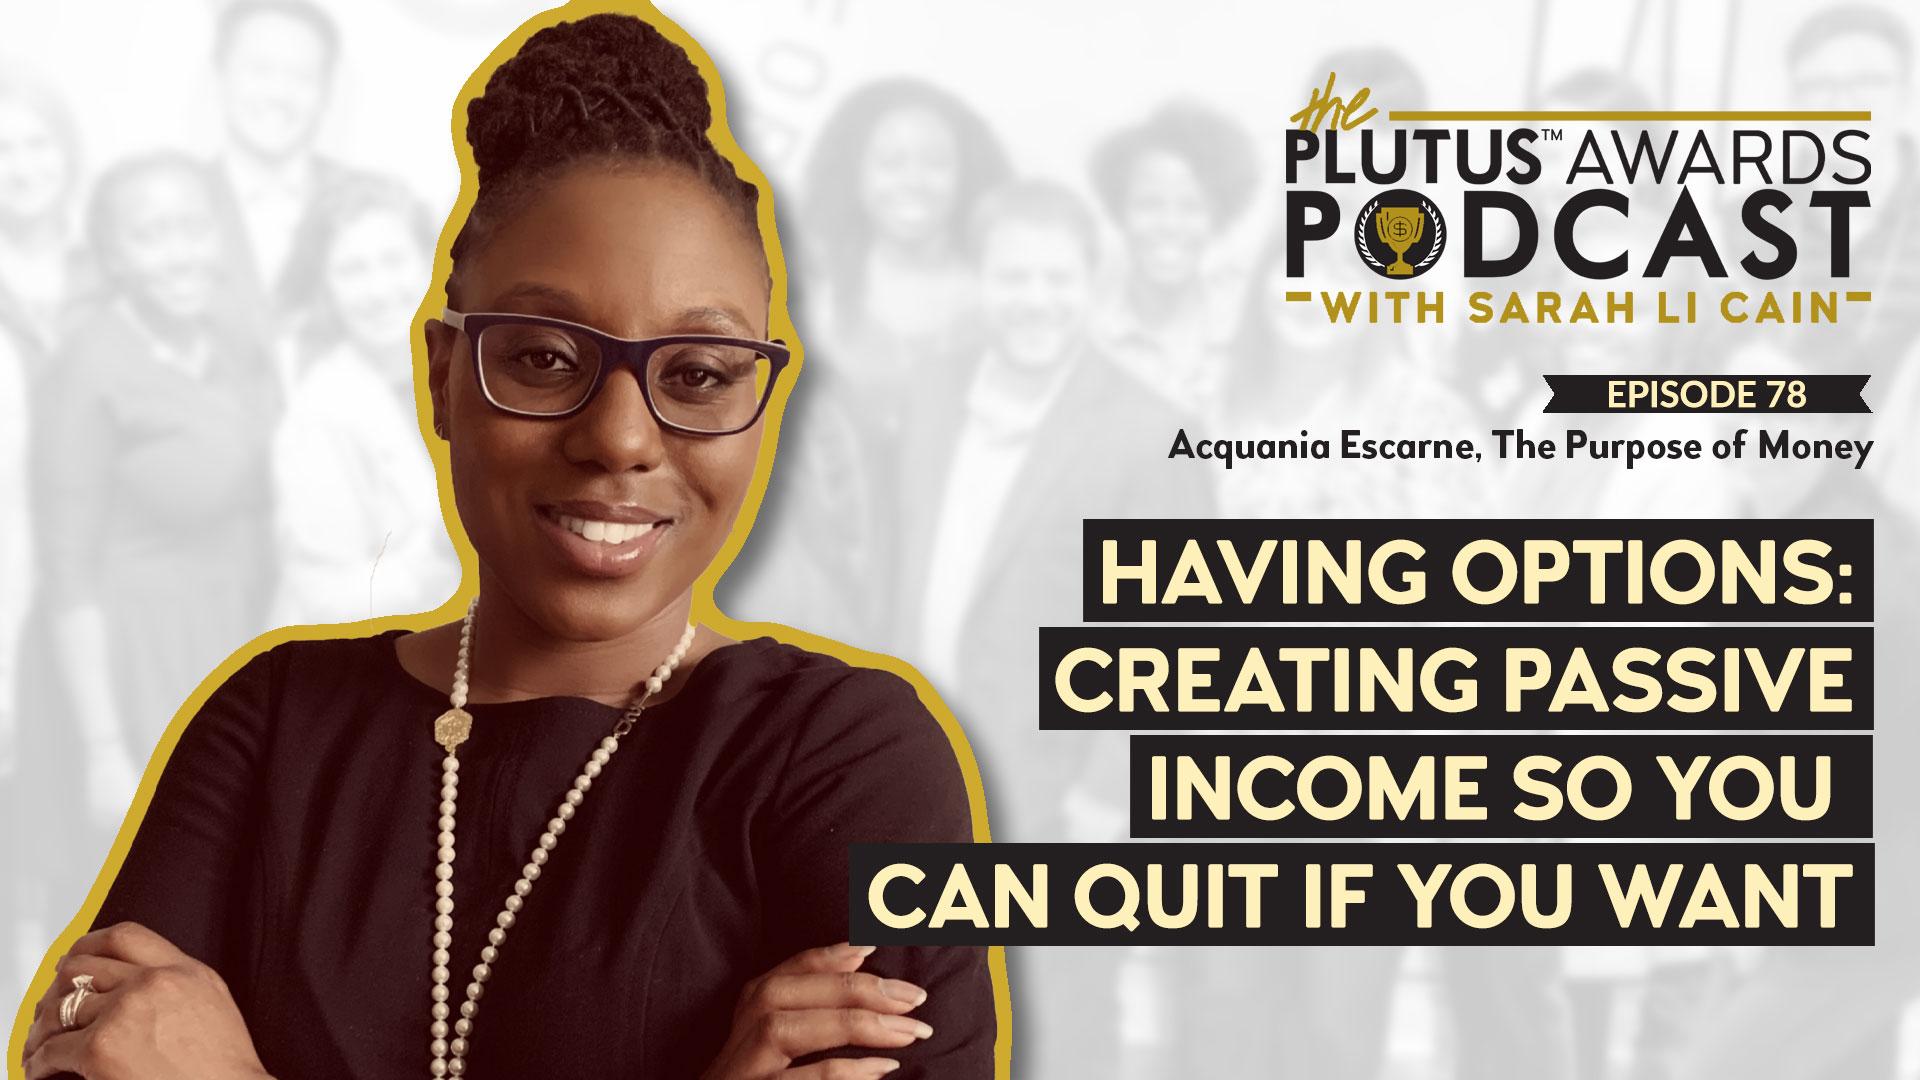 Plutus Awards Podcast - Acquania Escarne Featured Image